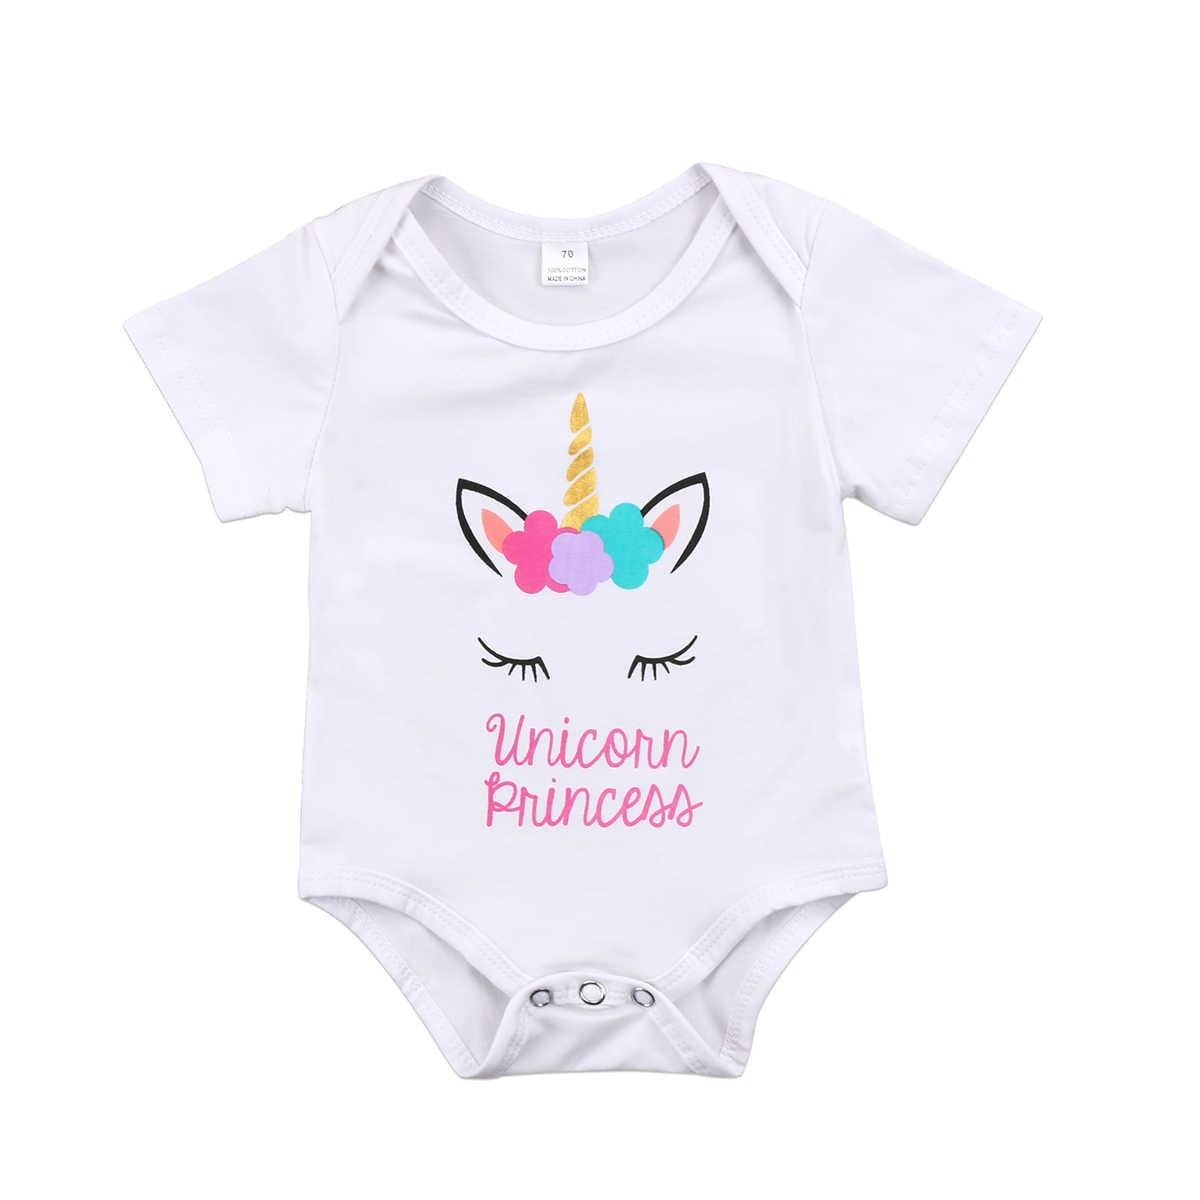 Dibujos Animados unicornio bebé Niñas Ropa algodón recién nacido niñas Pelele de manga corta Body suit verano mono traje de cumpleaños